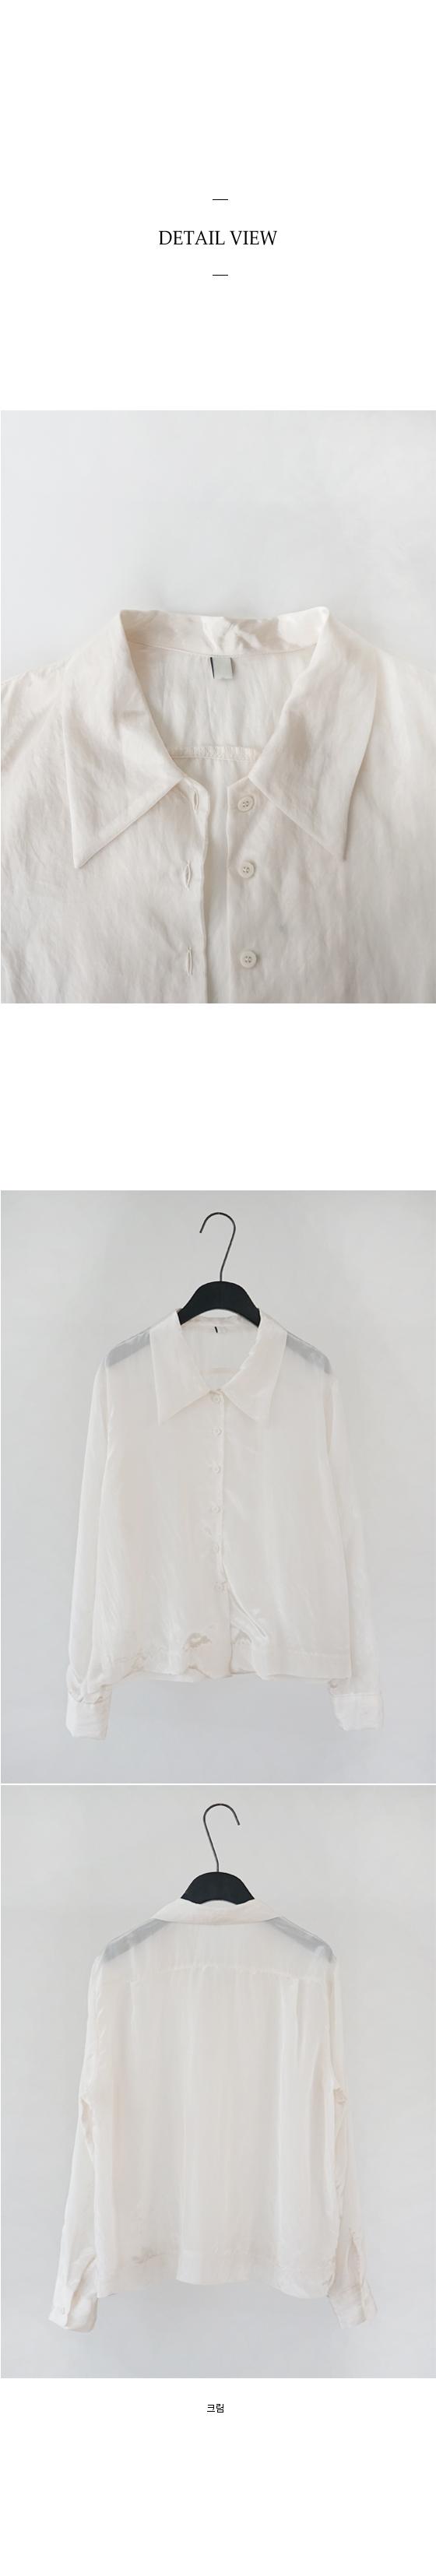 shining cream blouse